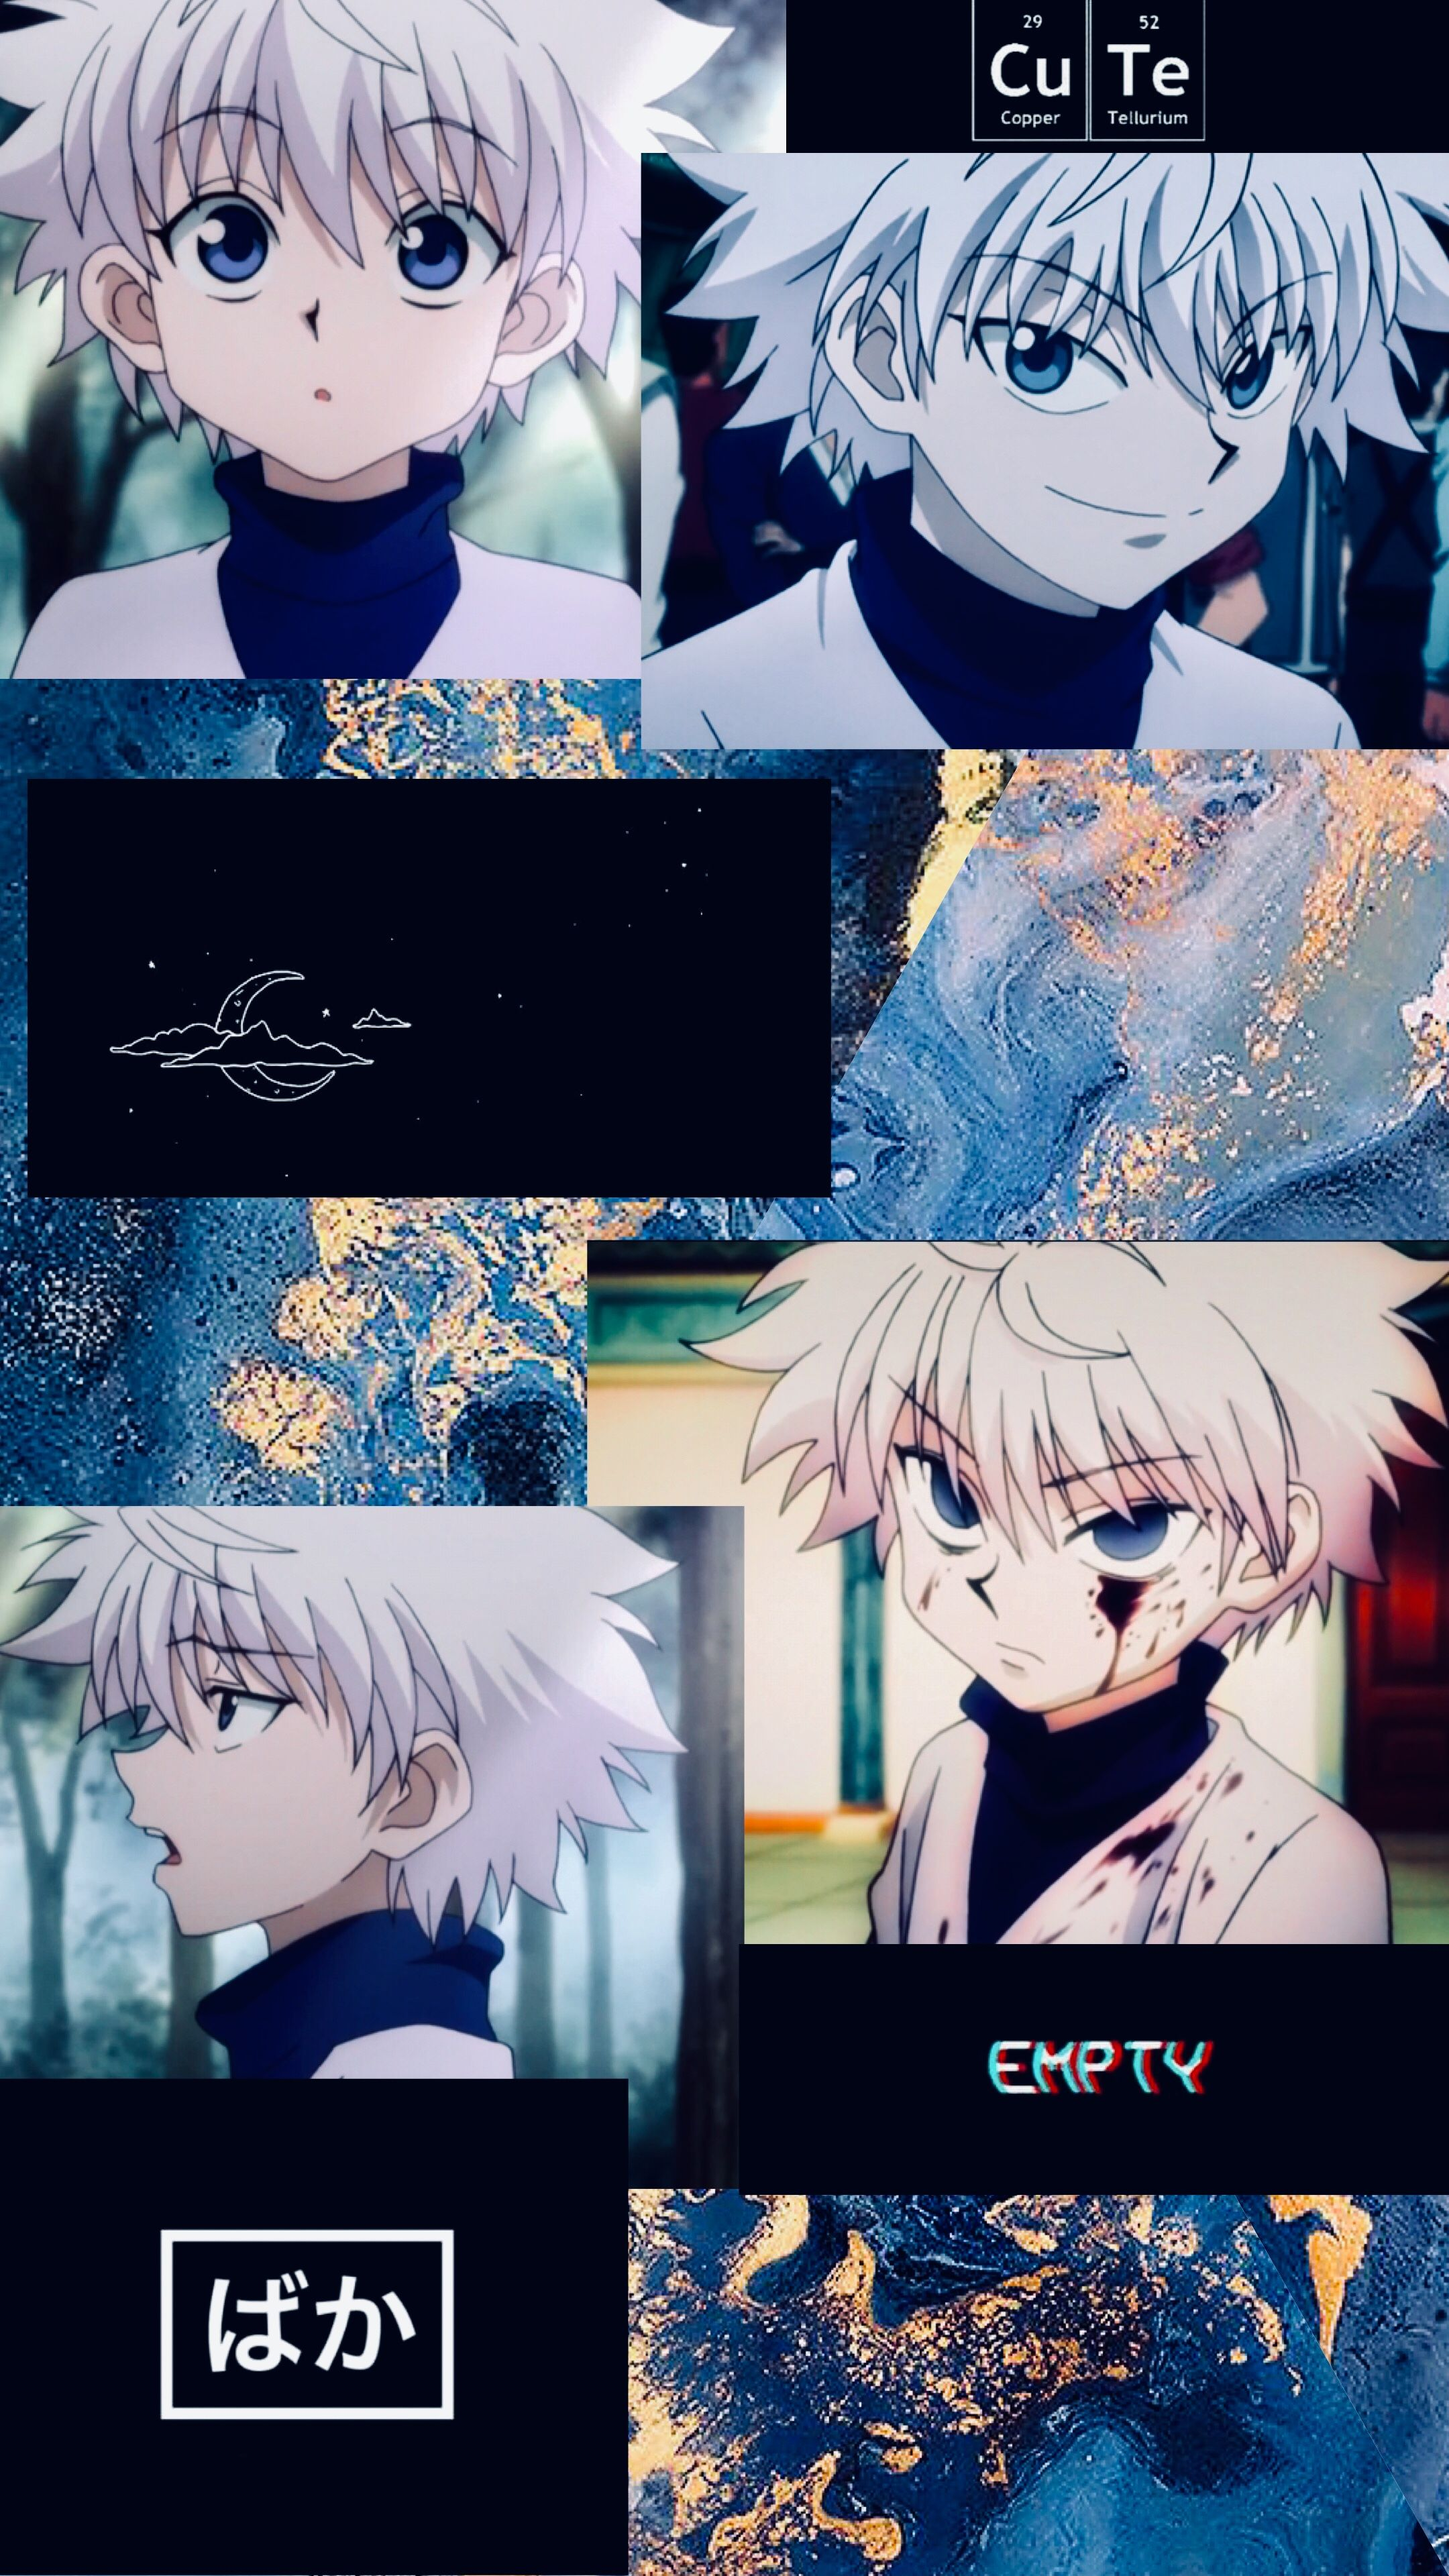 Pin By Tama Chan On Hunter X Hunter Cute Anime Wallpaper Aesthetic Anime Hunter Anime